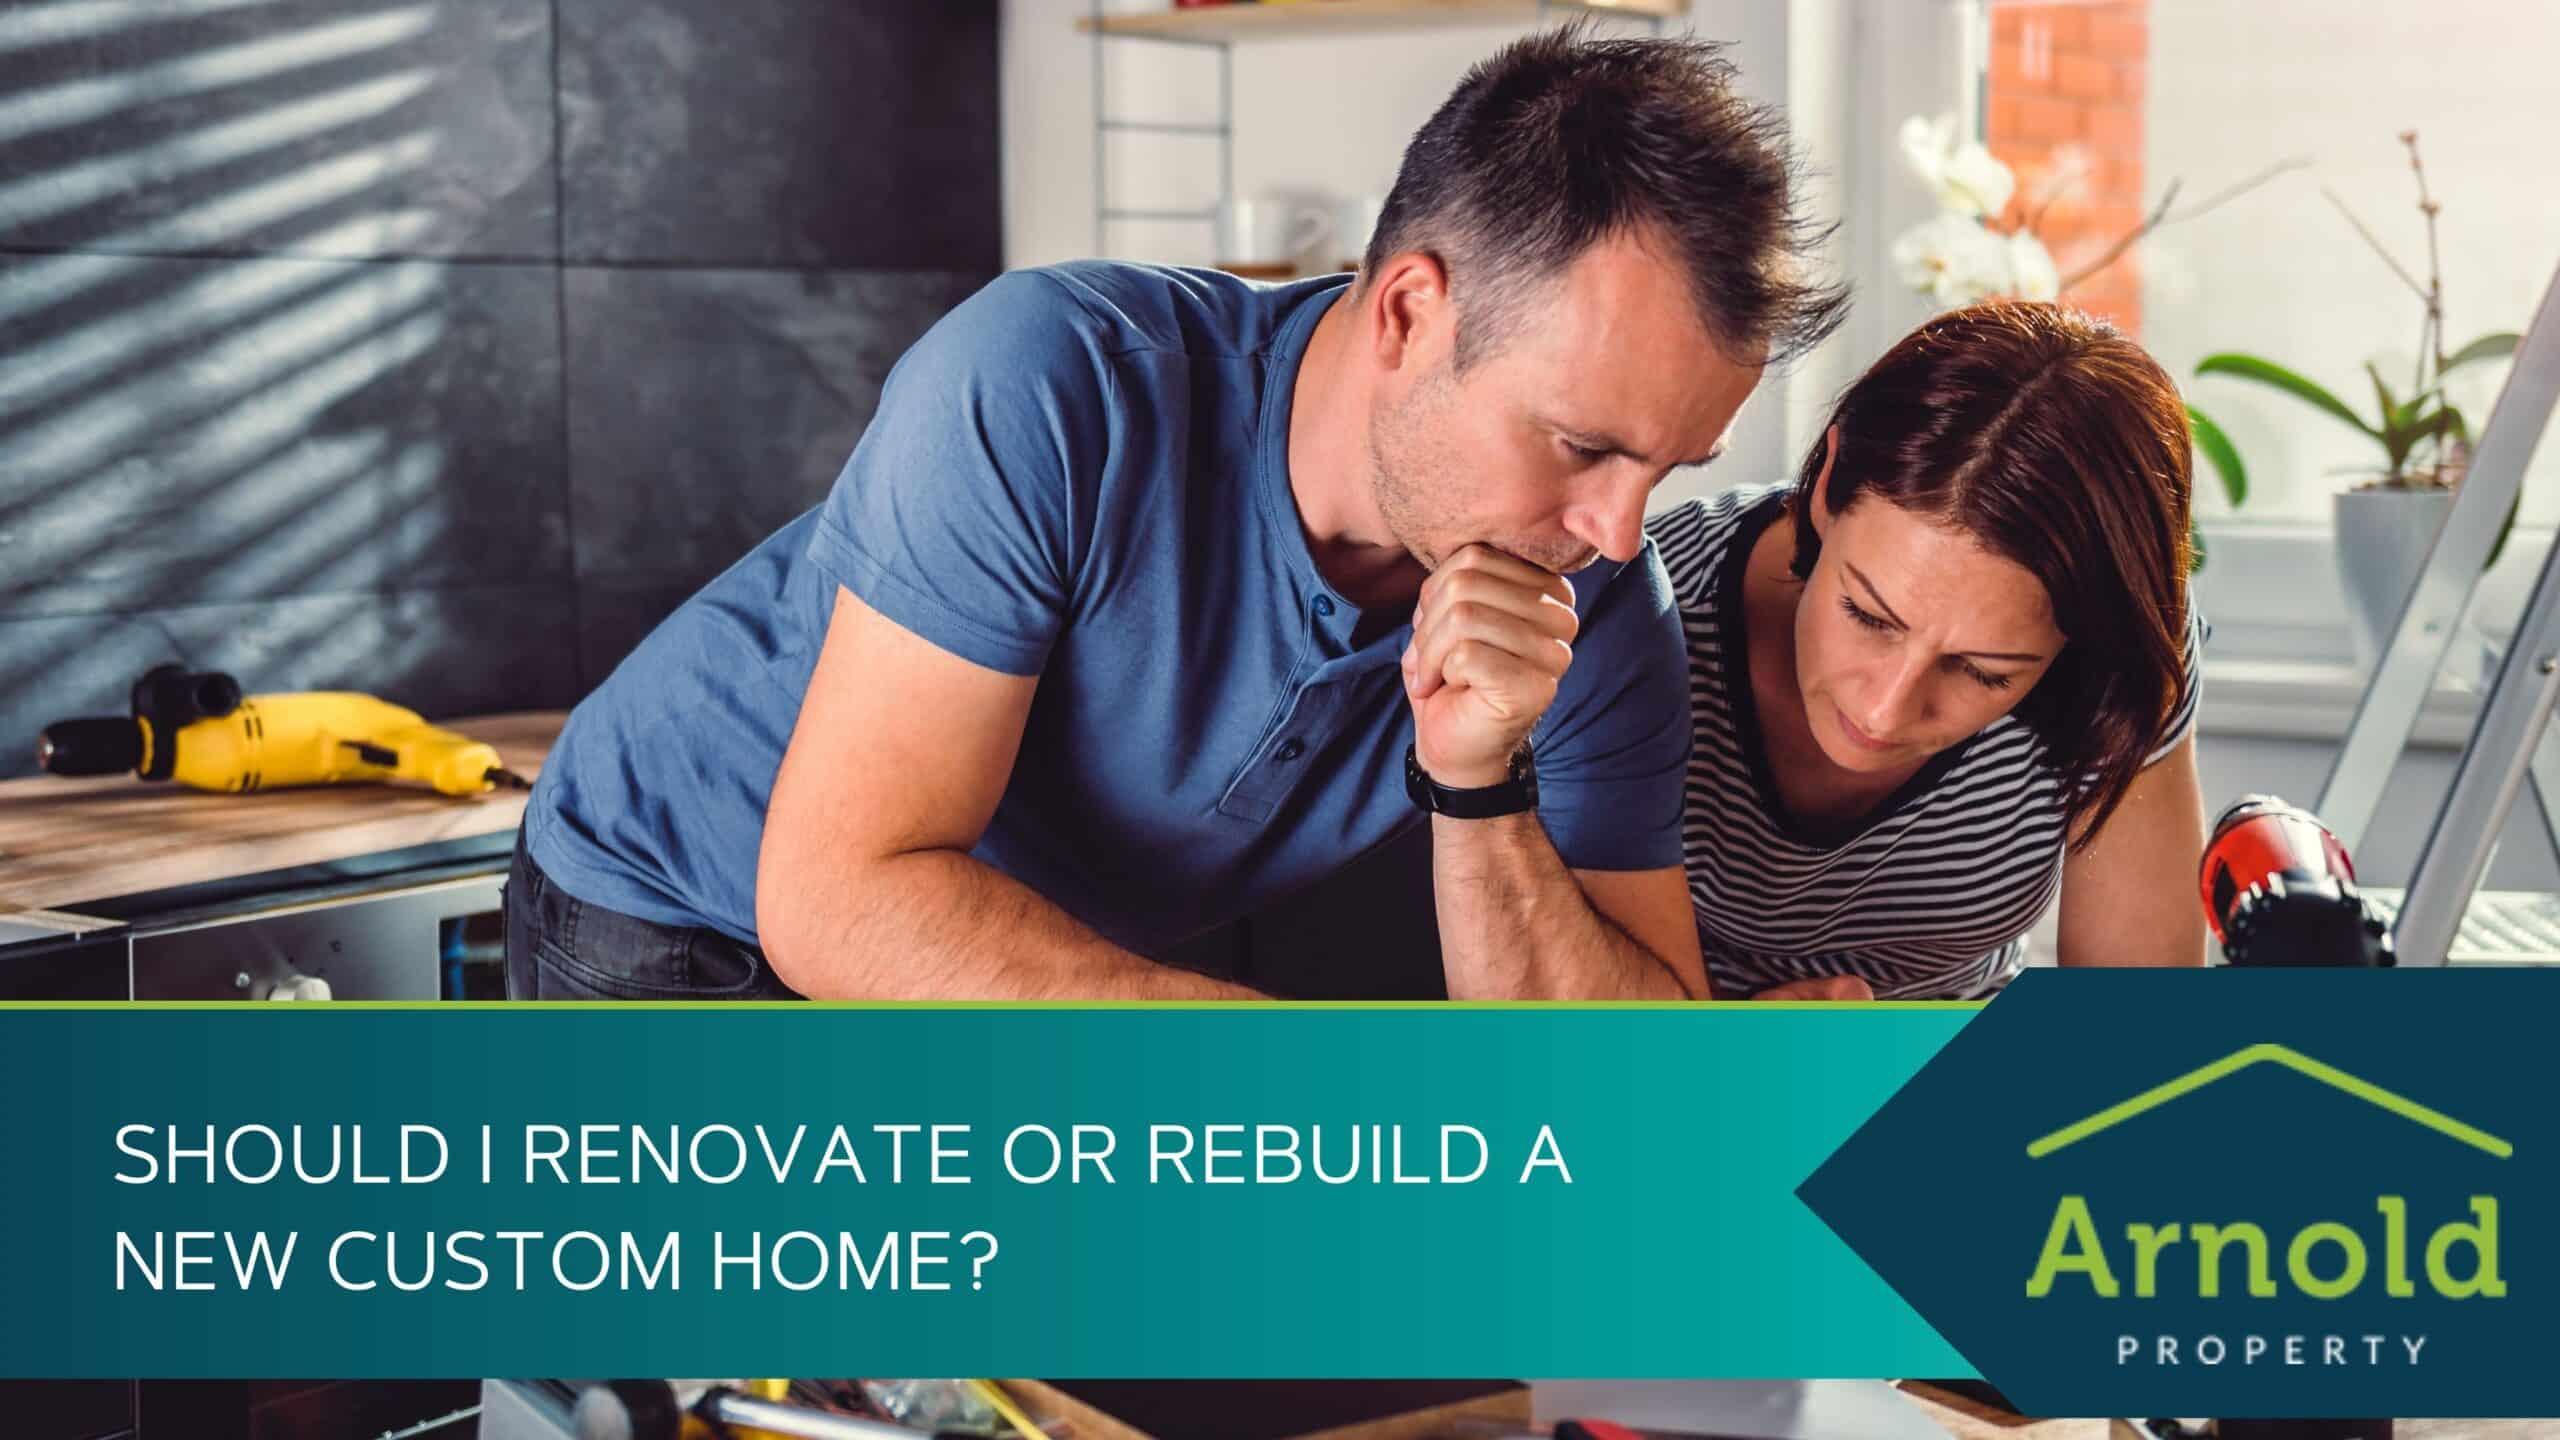 Should I Renovate or Rebuild a New Custom Home